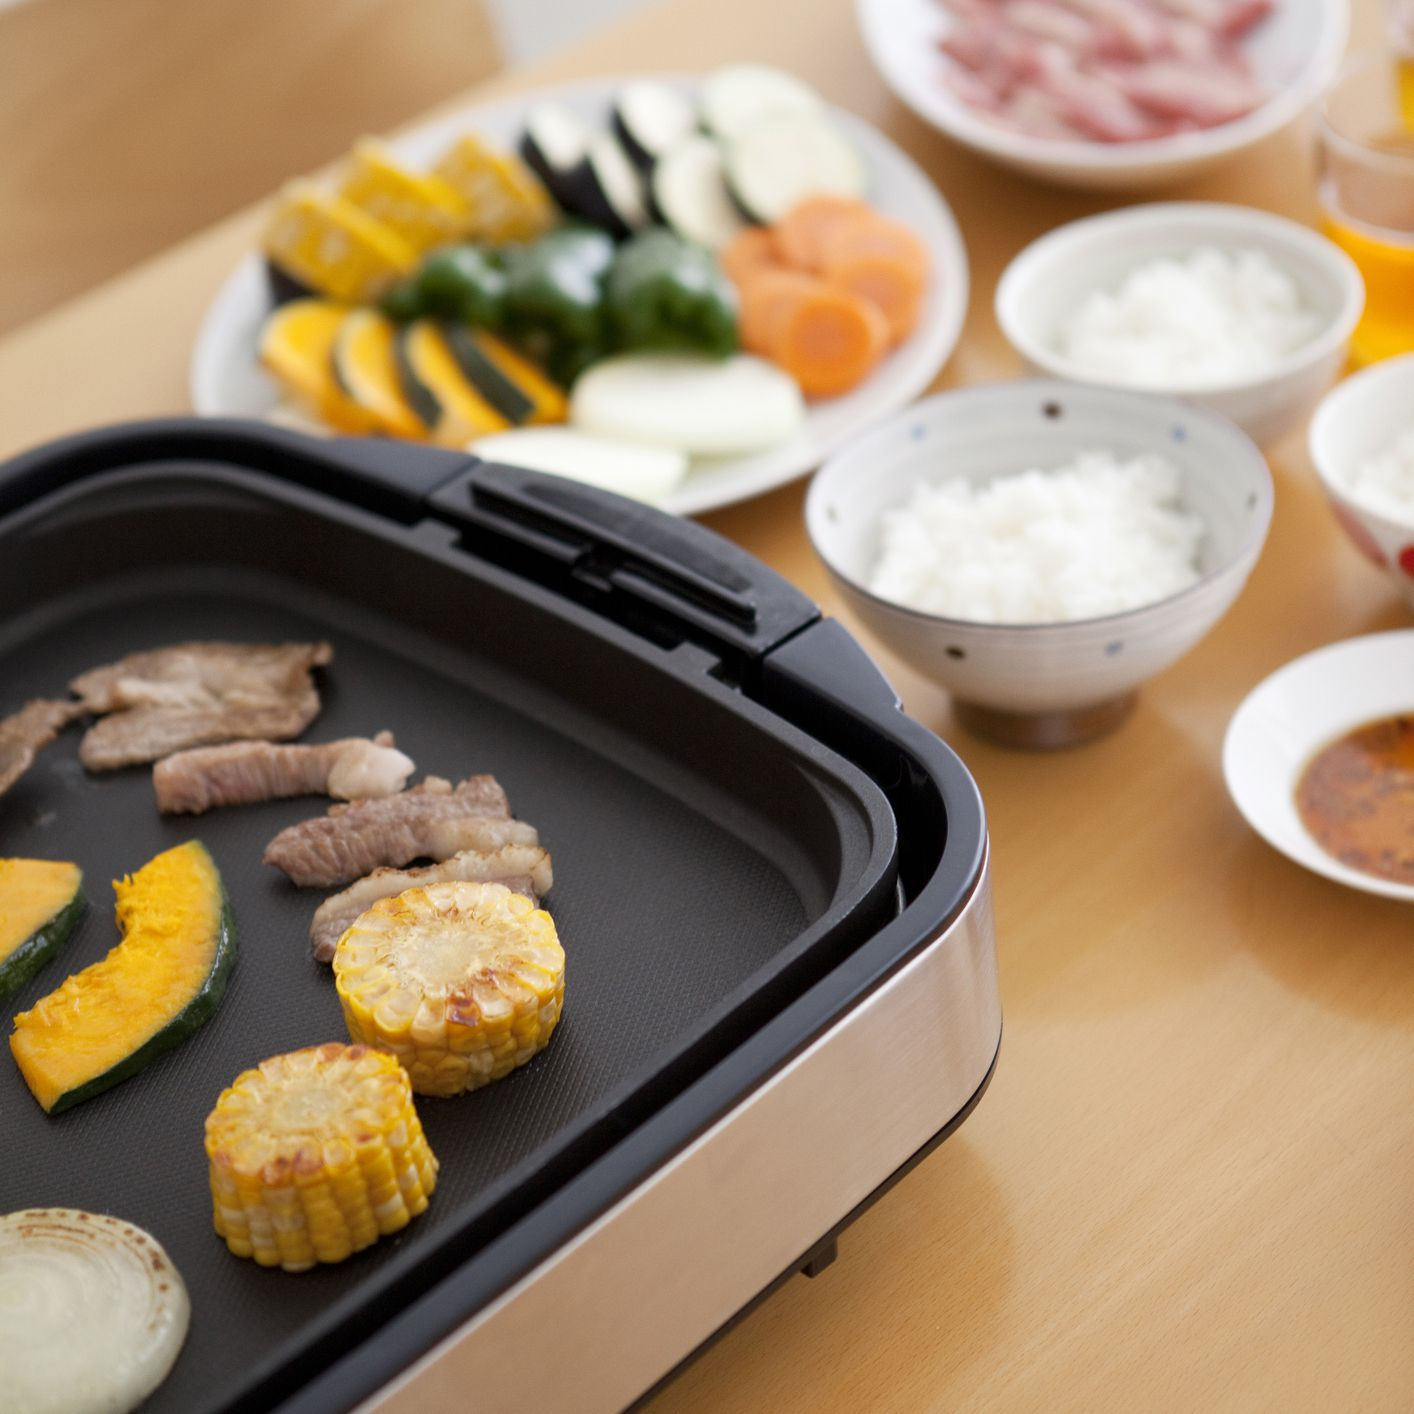 Teppanyaki Style Japanese Barbecue Using Iron Plate